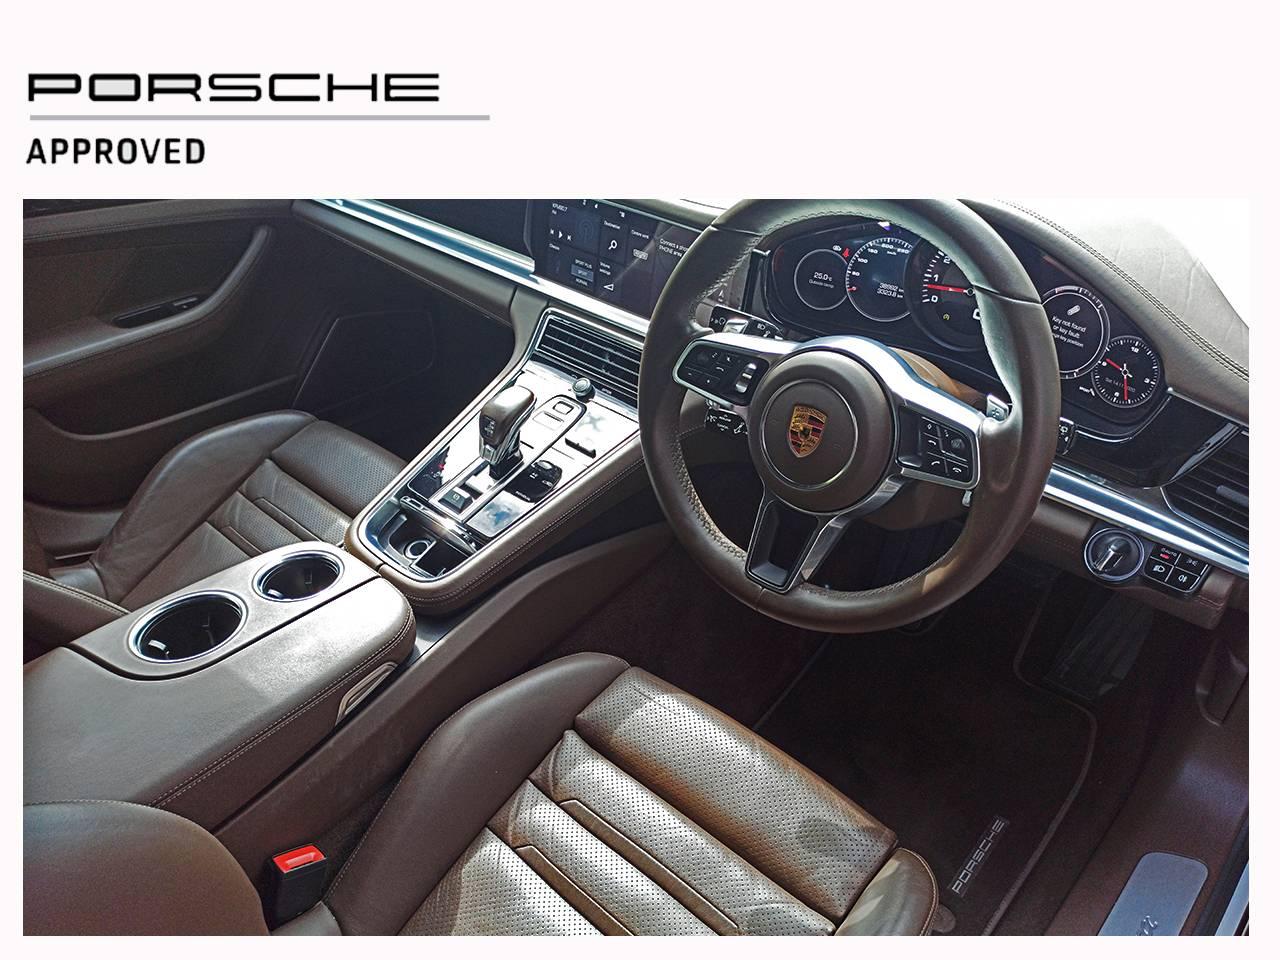 2017 Porsche Panamera – 4